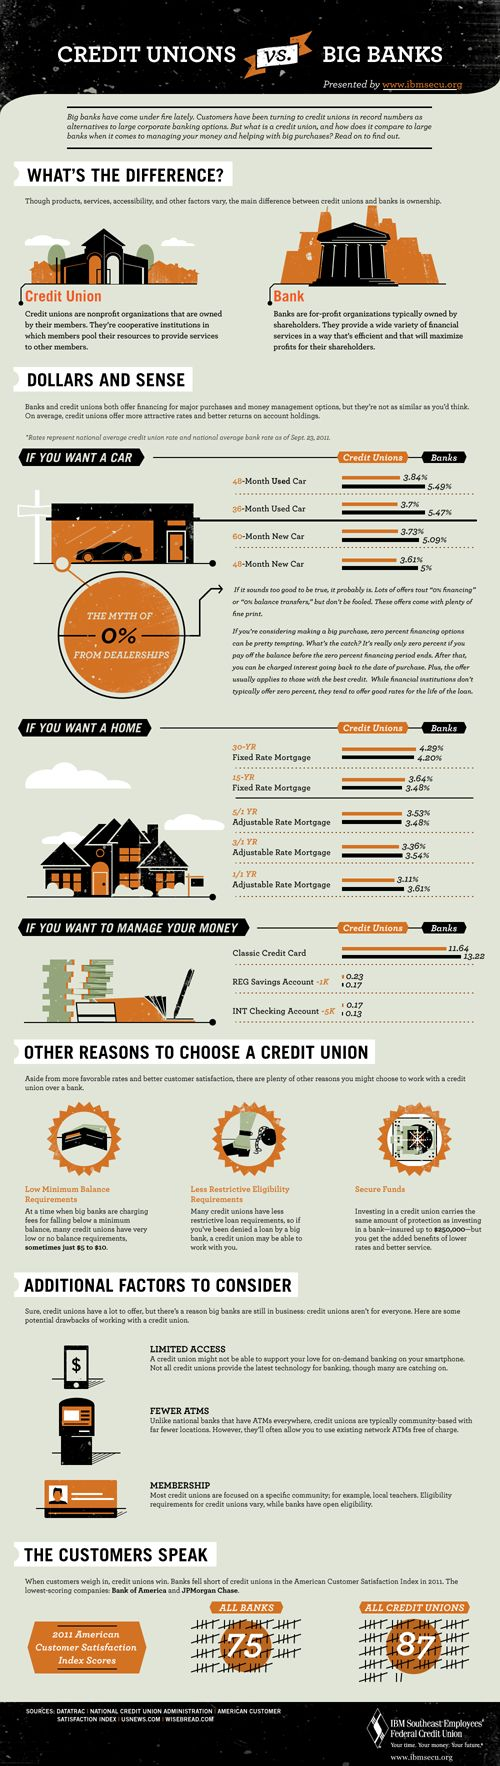 Banks vs Credit UnionsFinance Matter, Biggest Difference, Infografia Infographic, Union Difference, Creditunion, Mr. Big, Credit Union, Business Infographic, Big Banks